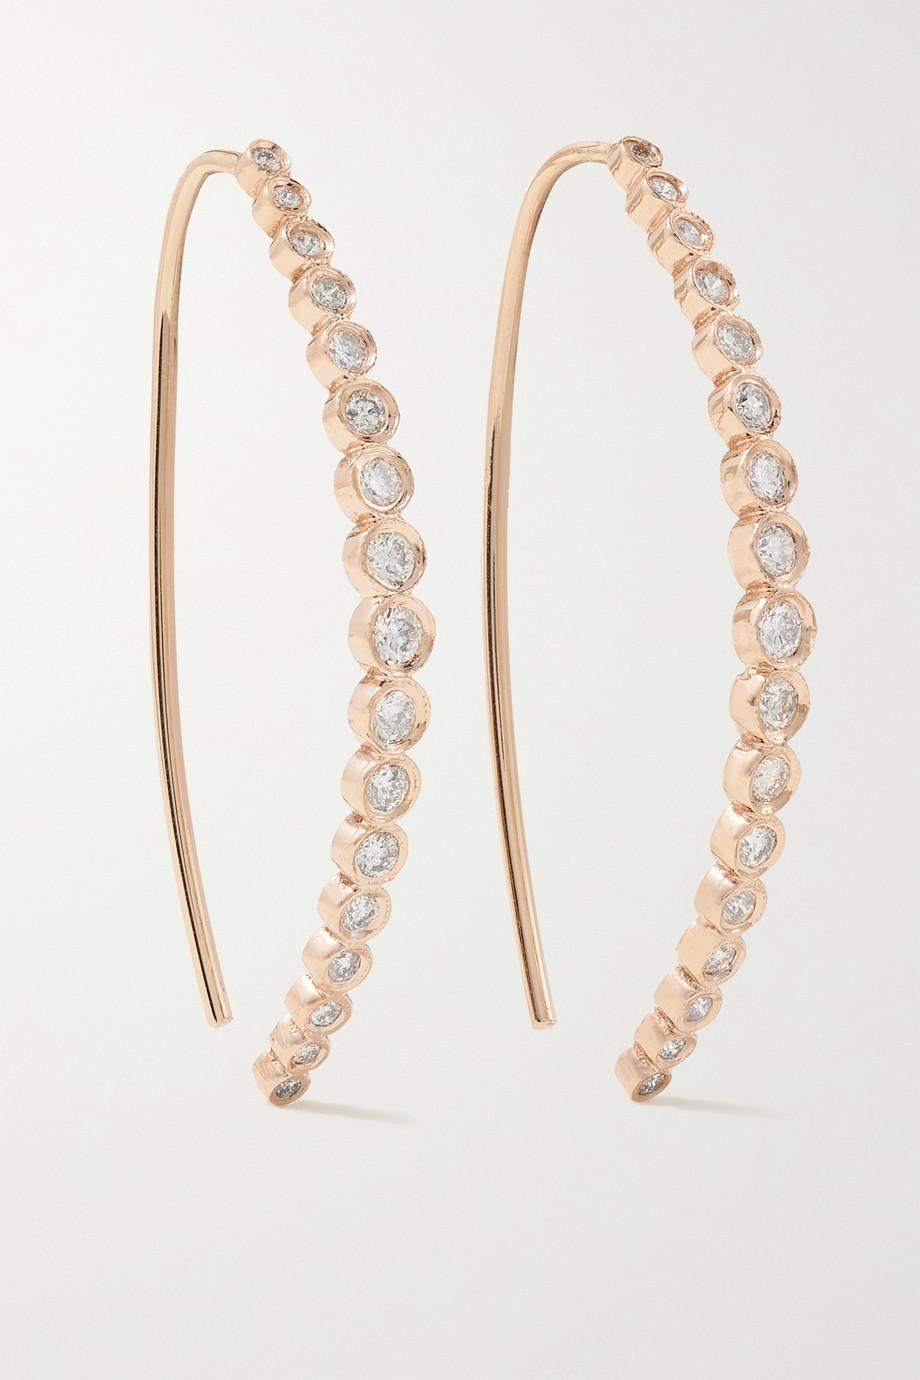 Jacquie Aiche Ohrringe aus 14Karat Roségold mit Diamanten